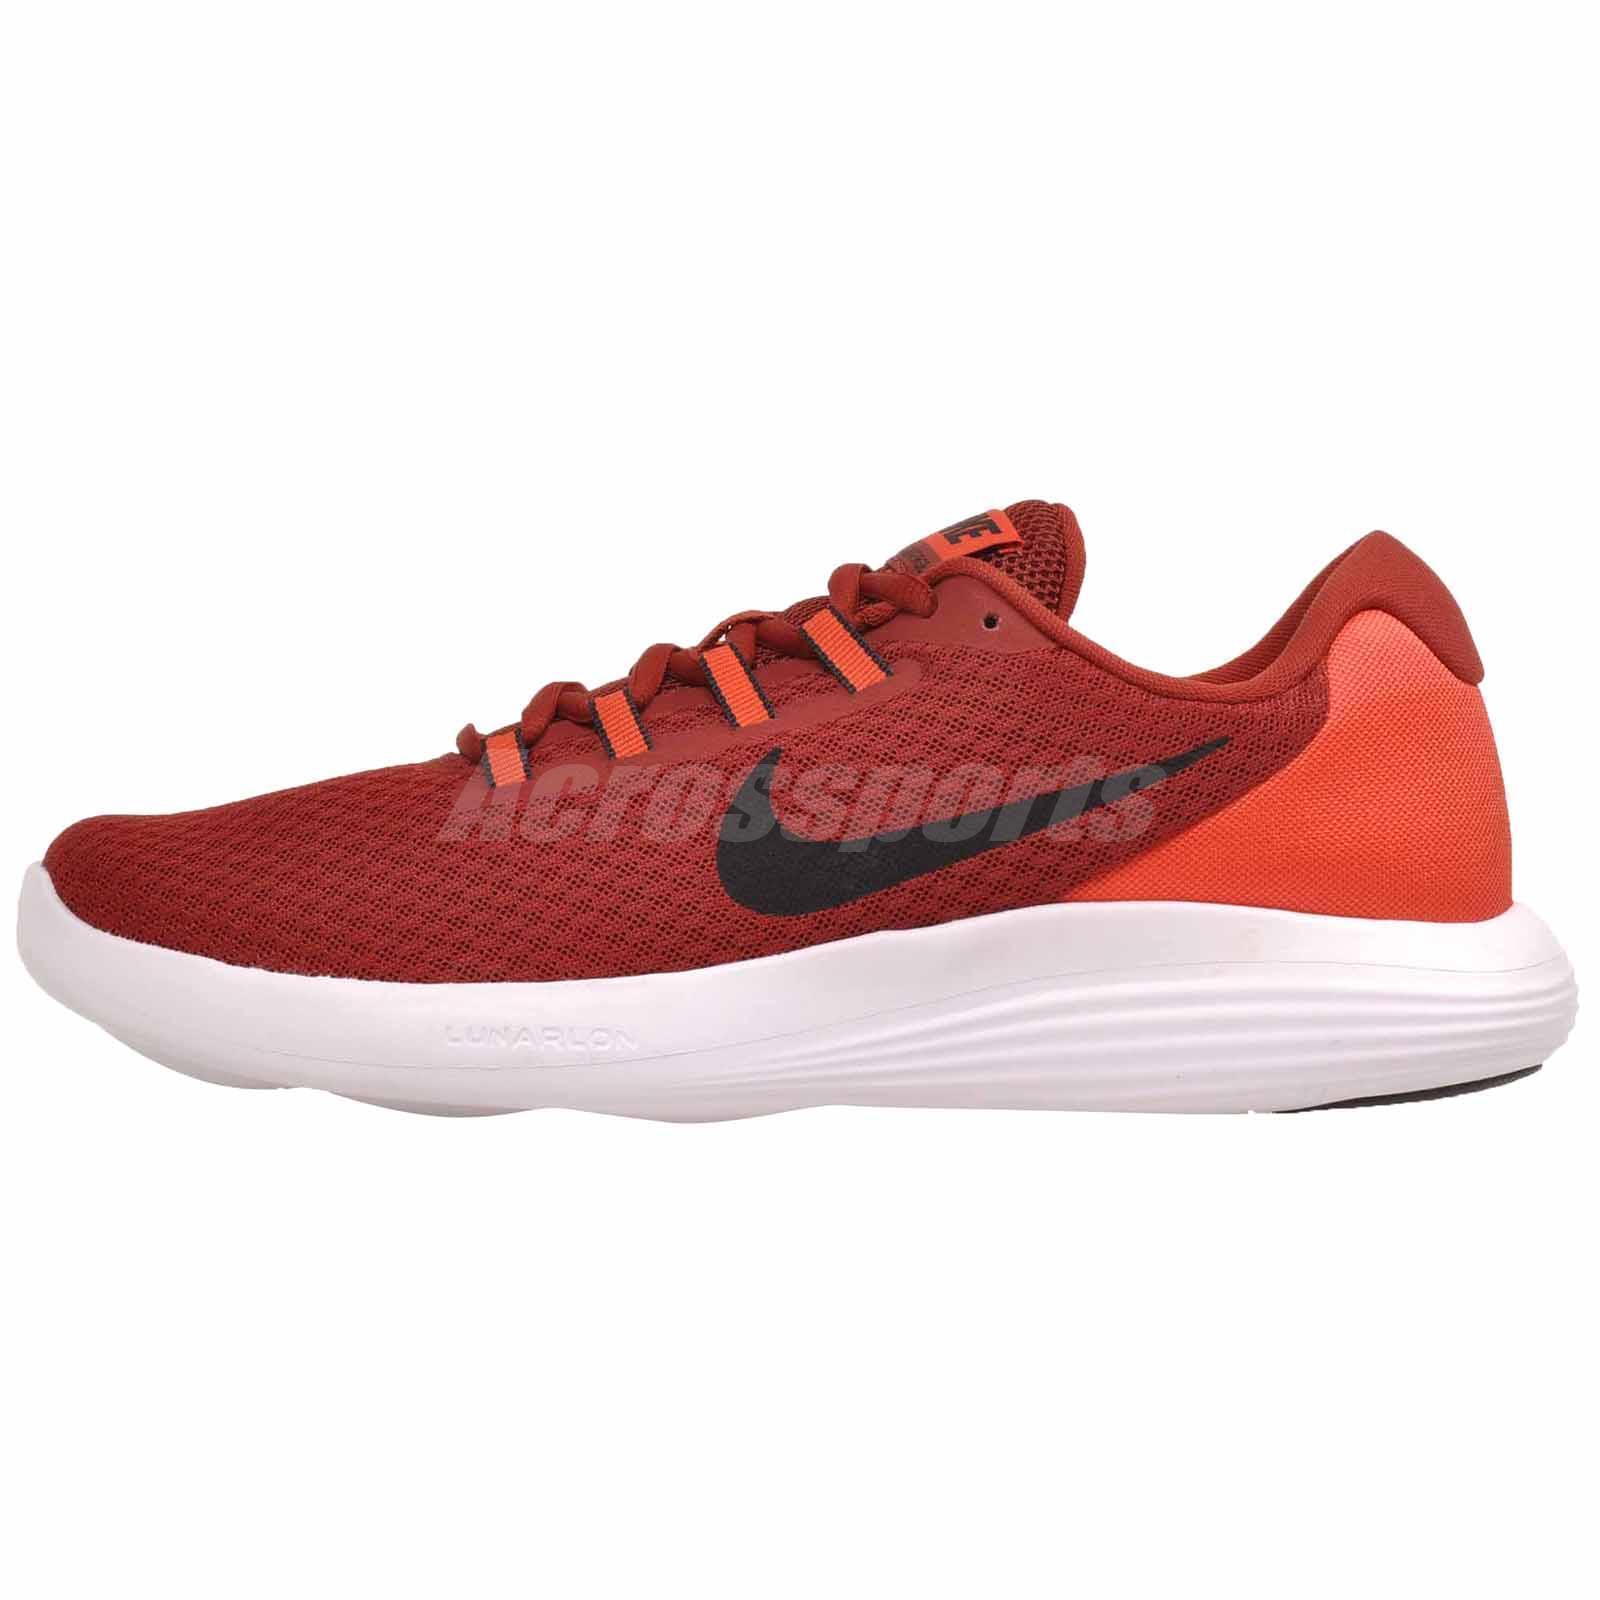 Nike Lunarconverge Running Mens shoes Red orange 852462-600